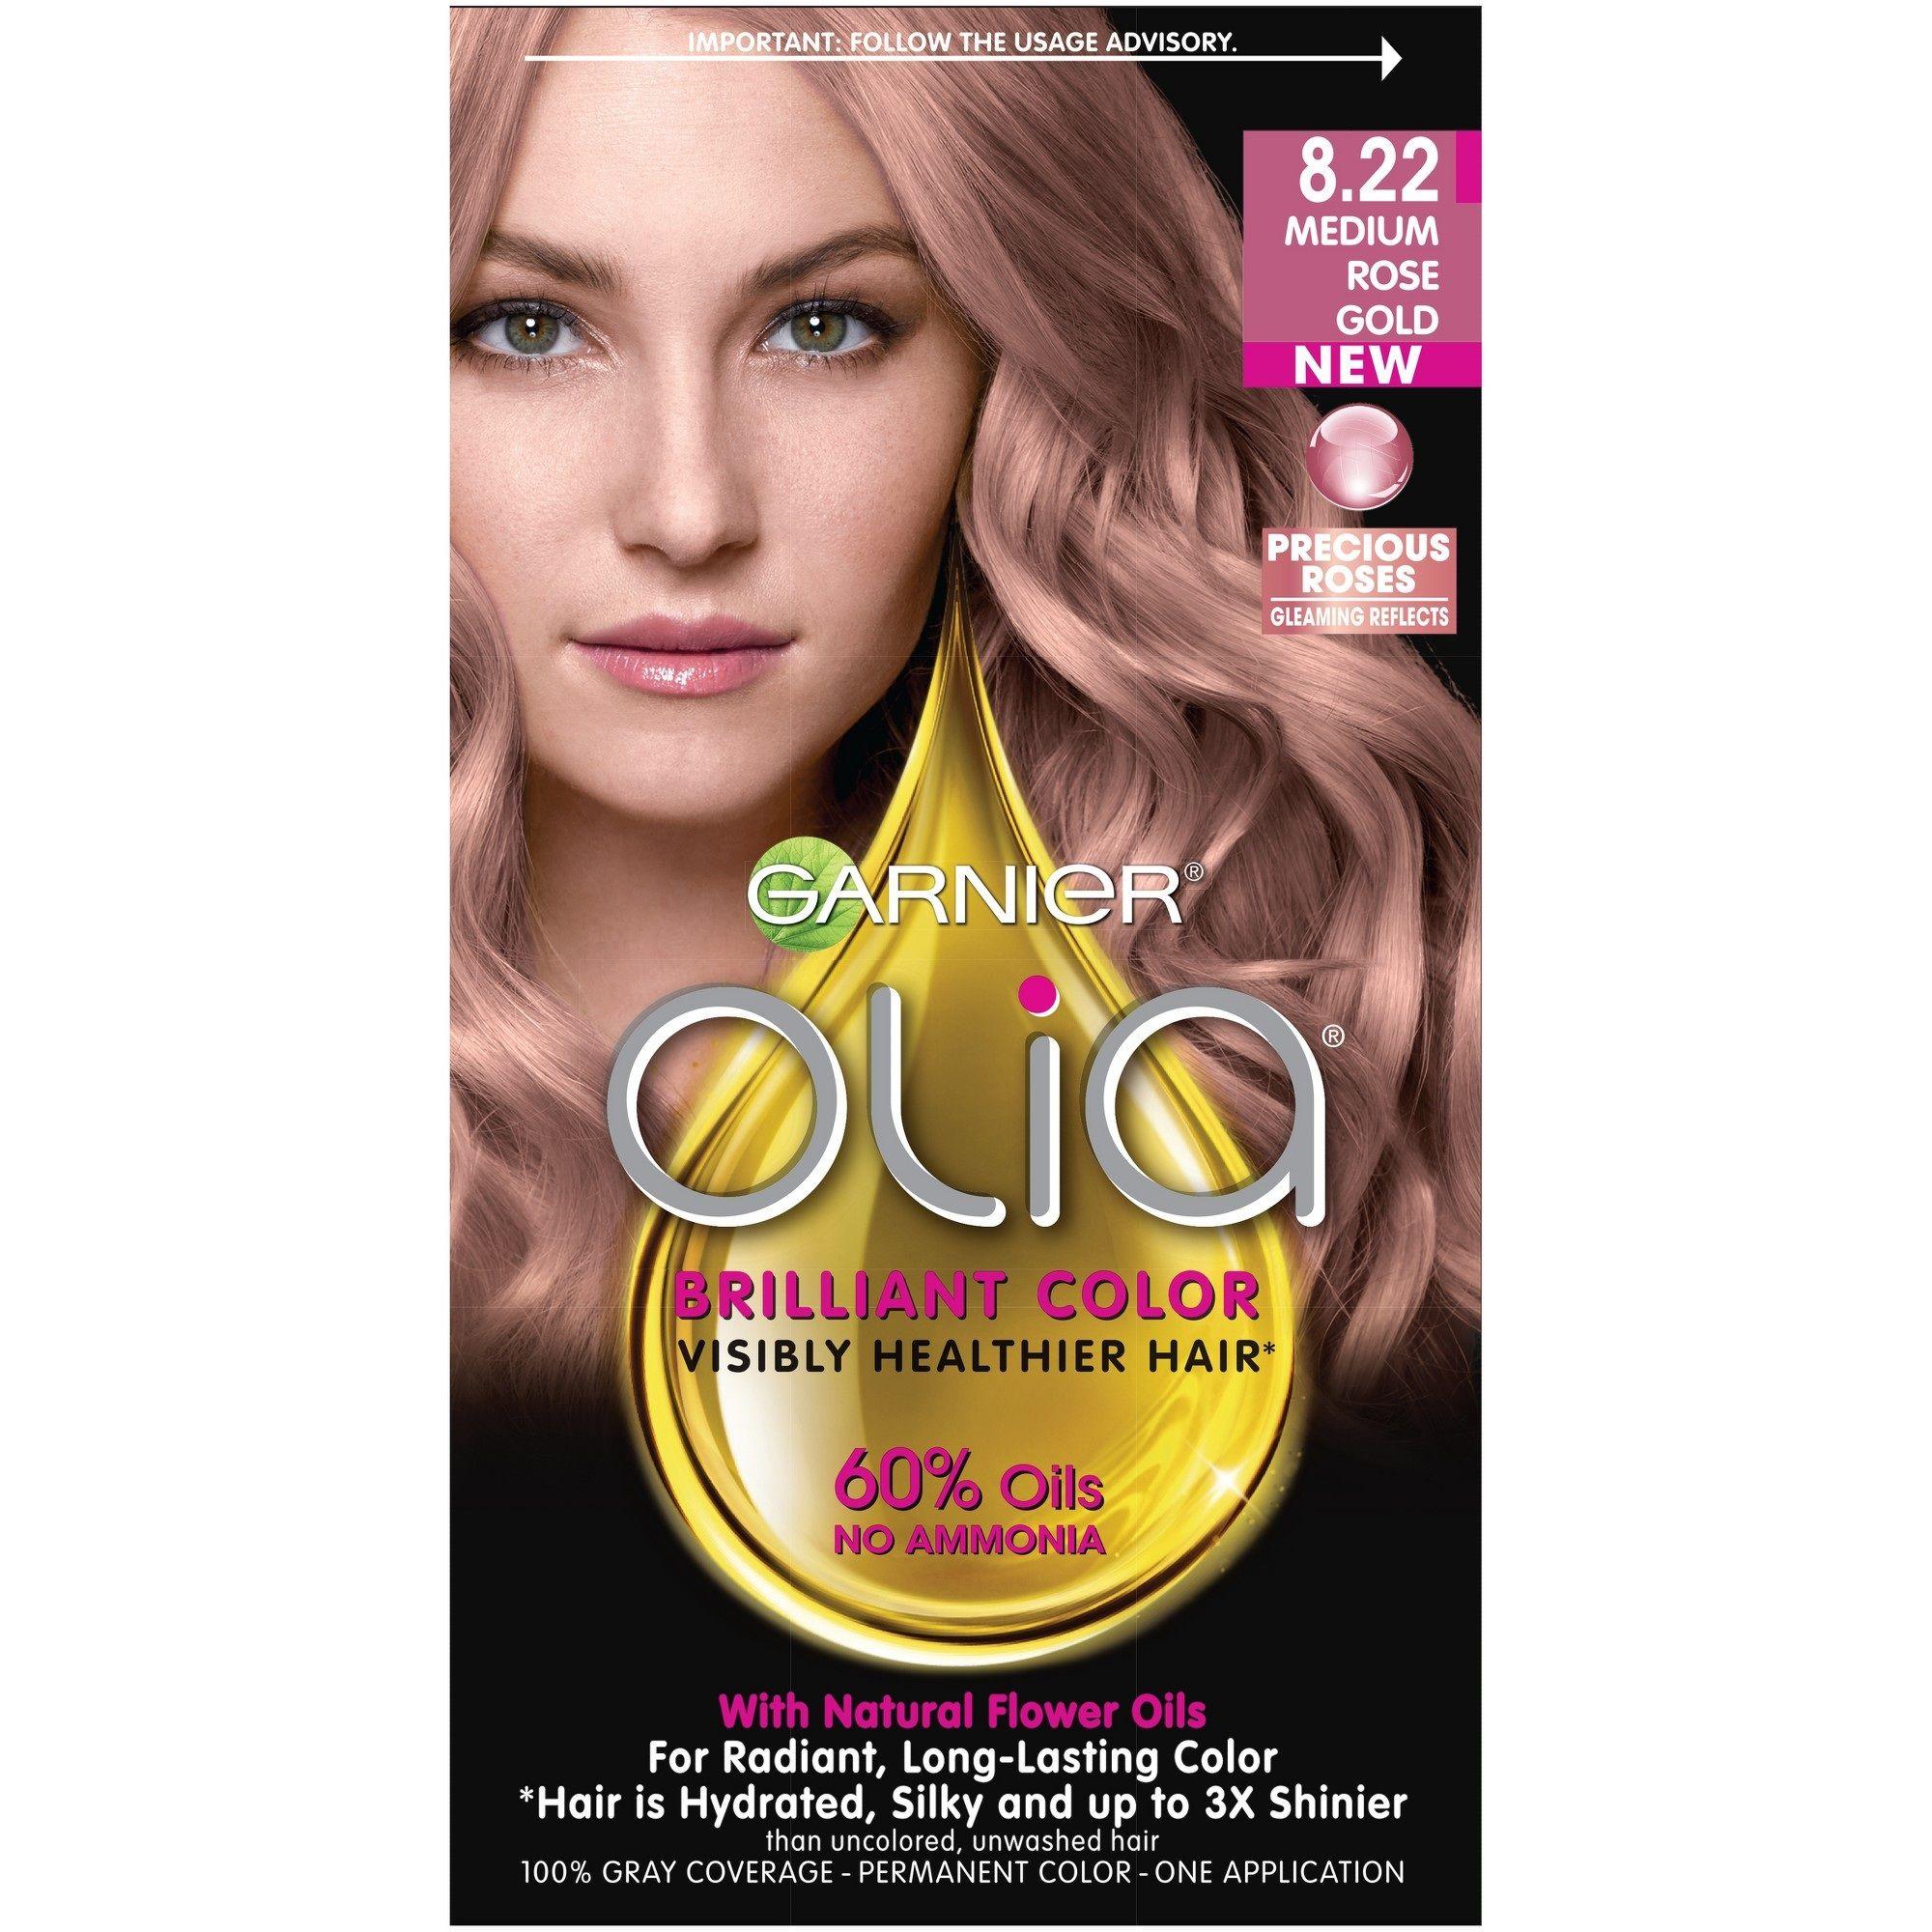 La Revanche D Une Blonde Check More At Https Www Nicolasbravo Info La Revanche D Une Blonde Garnier Hair Color Garnier Olia Hair Color